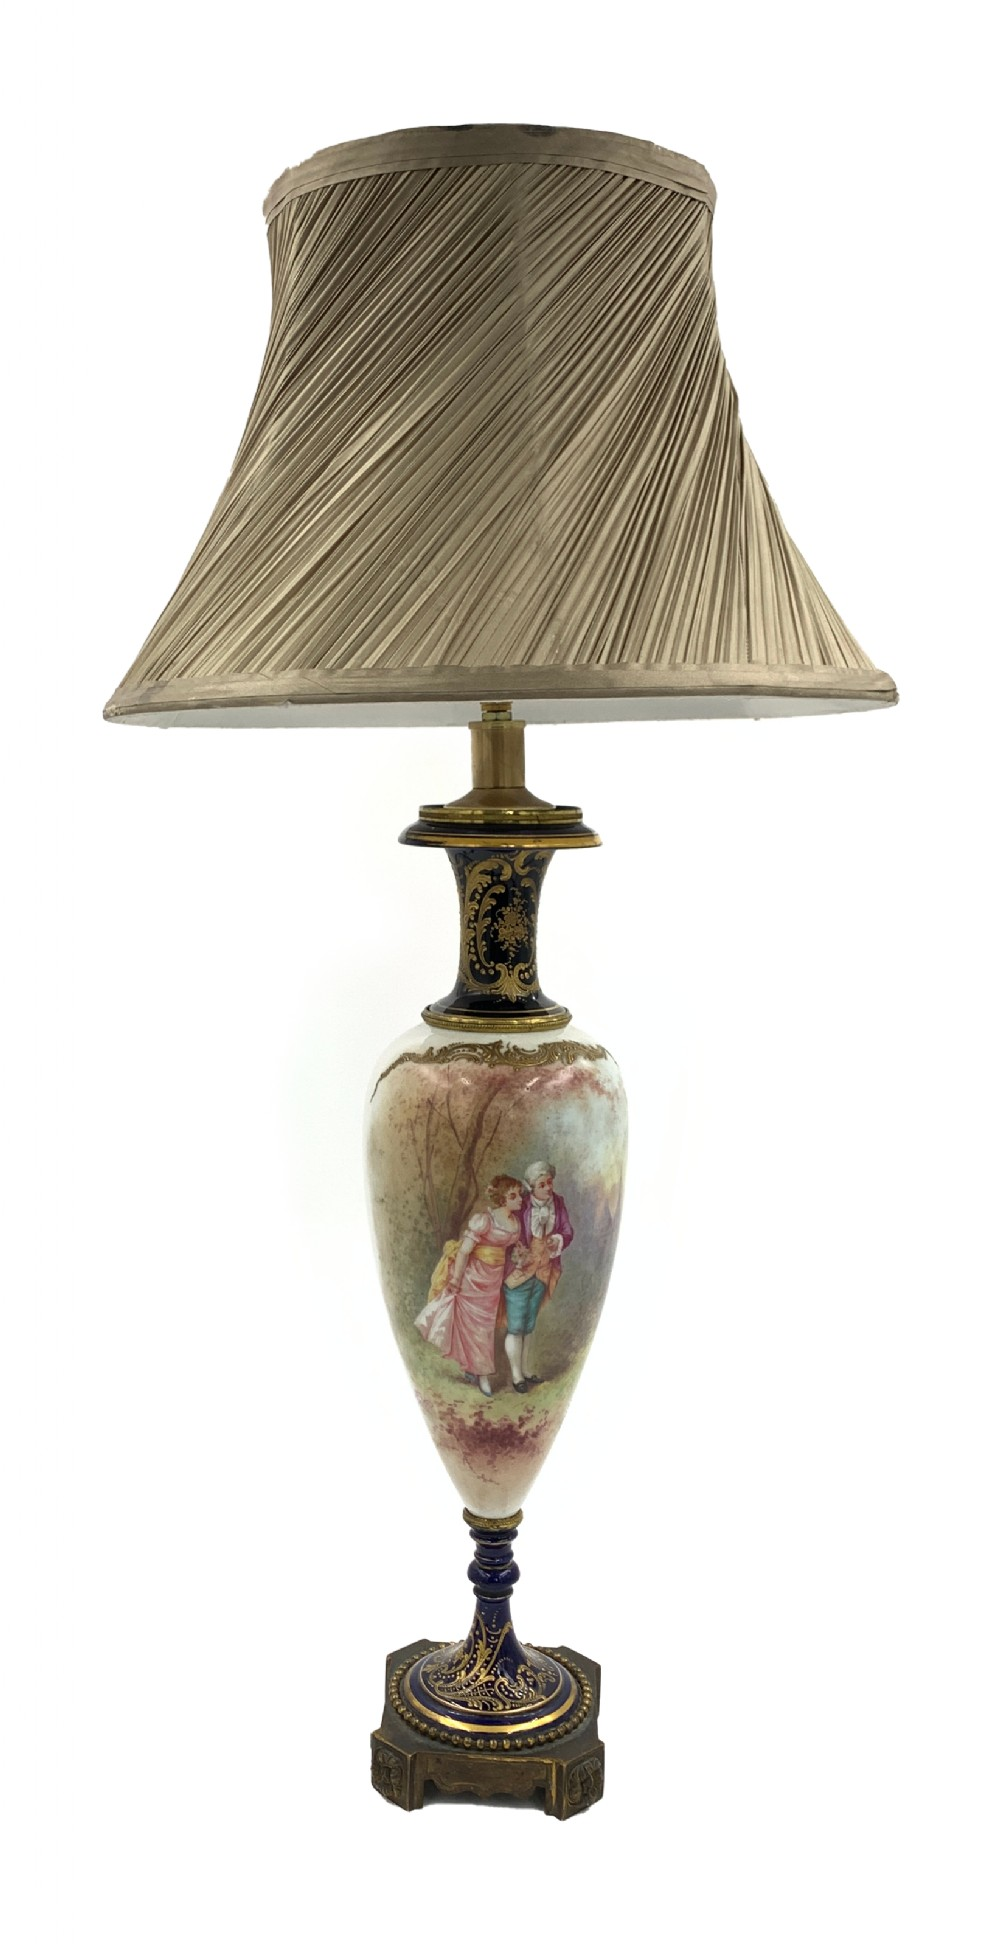 antique blue sevres style porcelain table lamp france 19th century